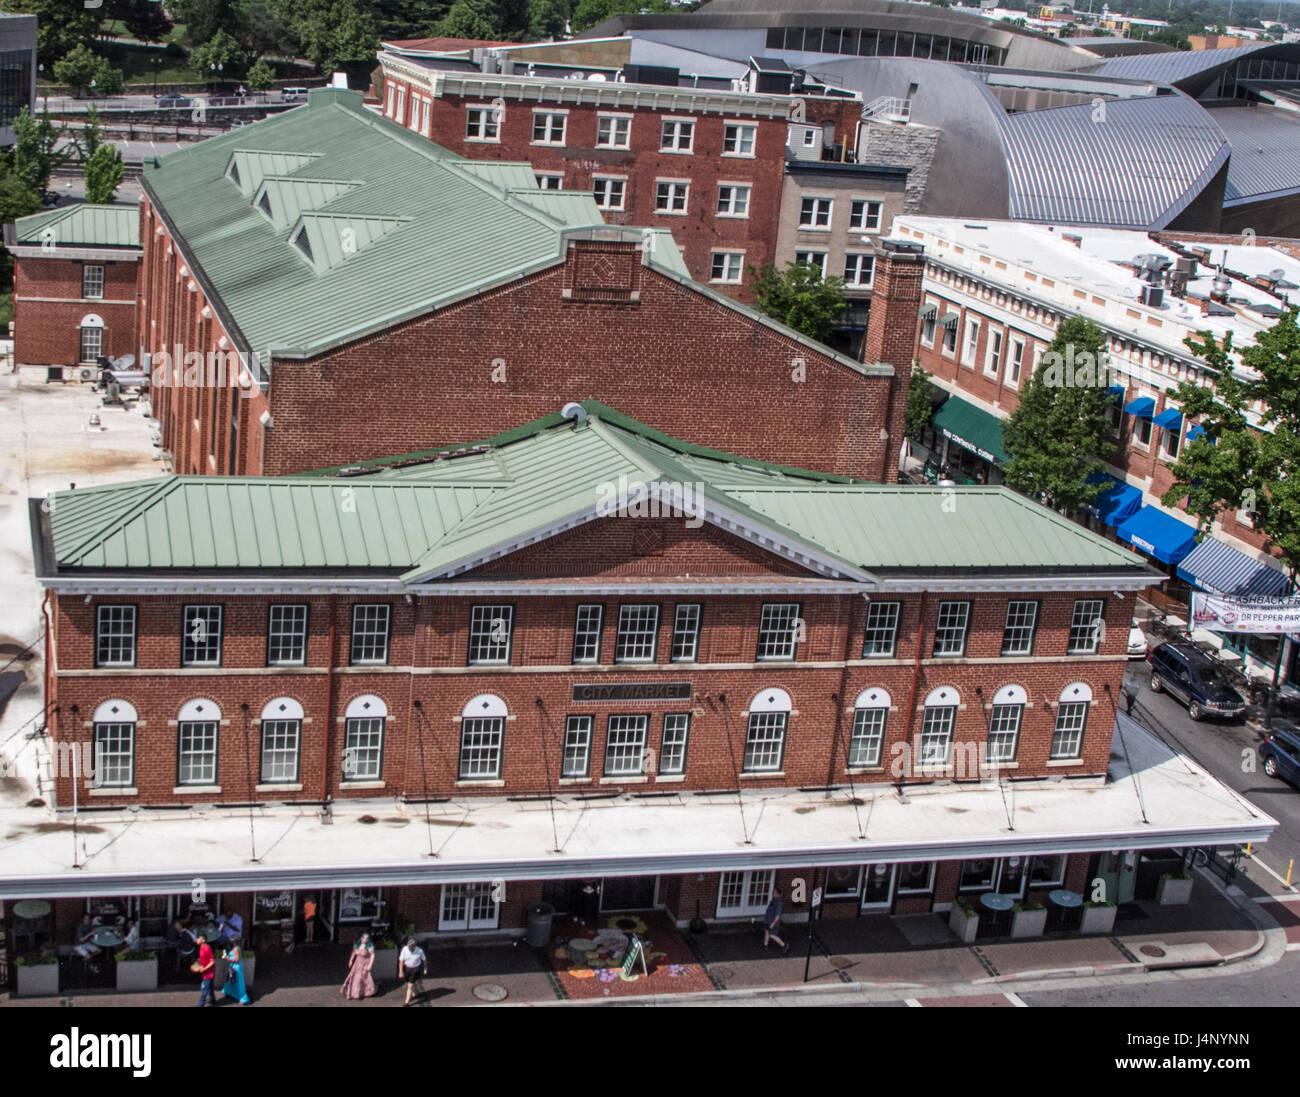 Roanoke City Market - Stock Image